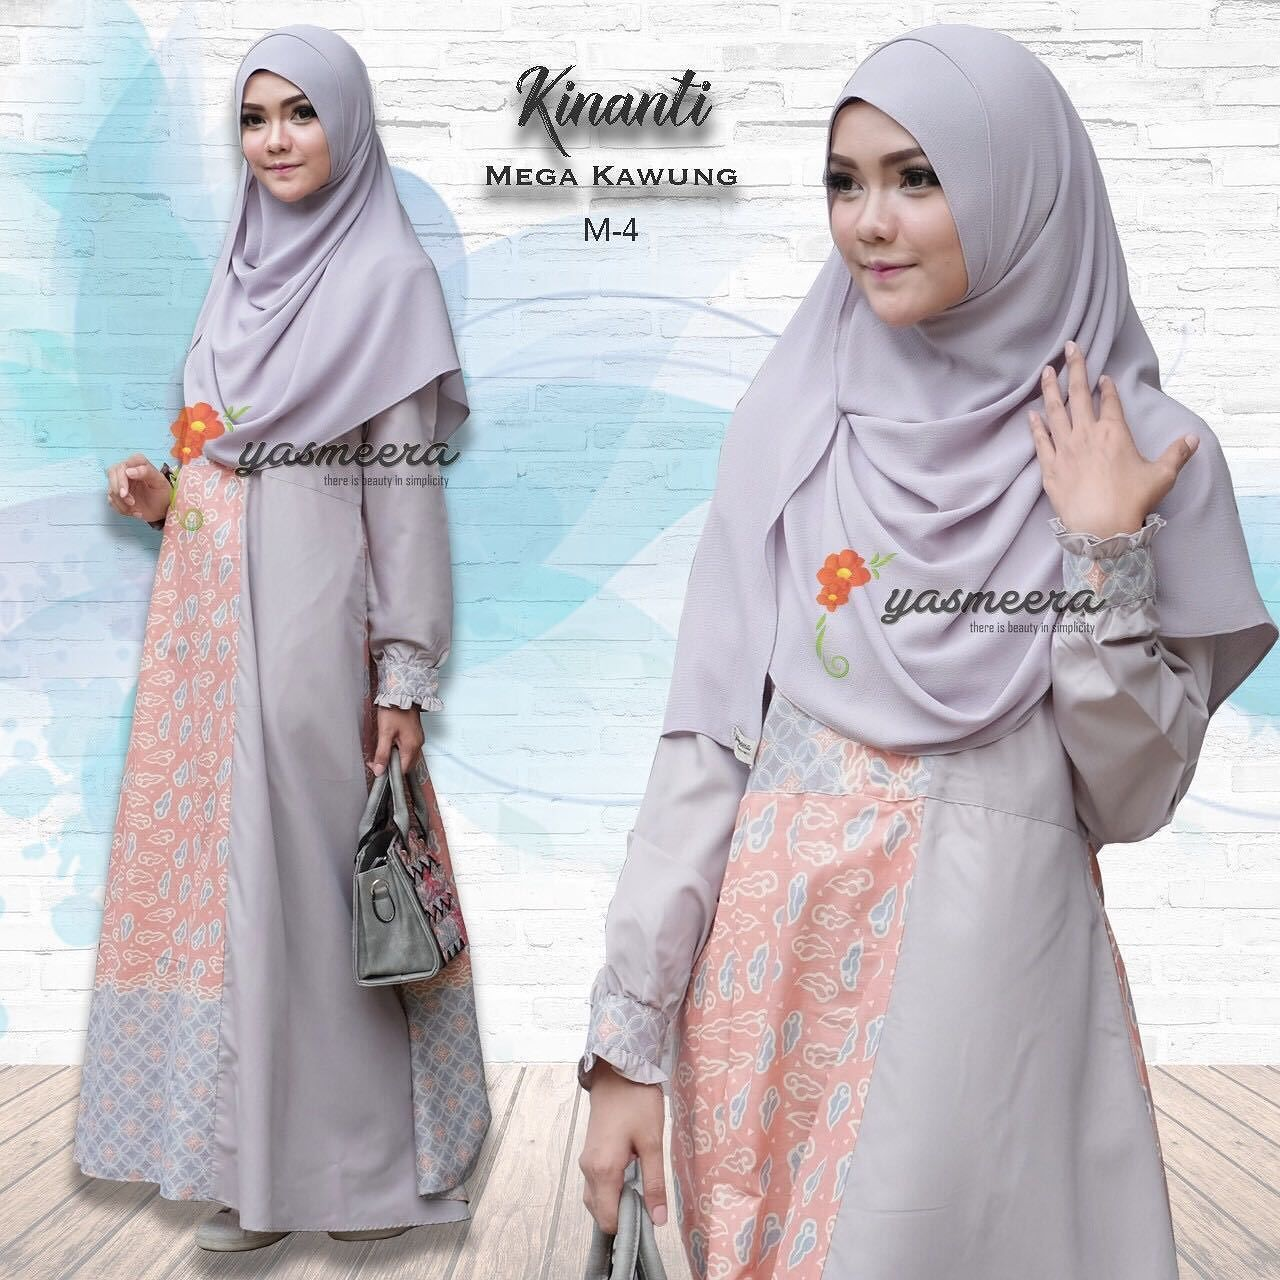 Gamis Yasmeera Kinanti Dress Mega Kawung M4 Baju Muslim Wanita Baju Muslimah Untukmu Yg Cantik Syari Dan Trendy Mater Baju Muslim Valentino Model Pakaian